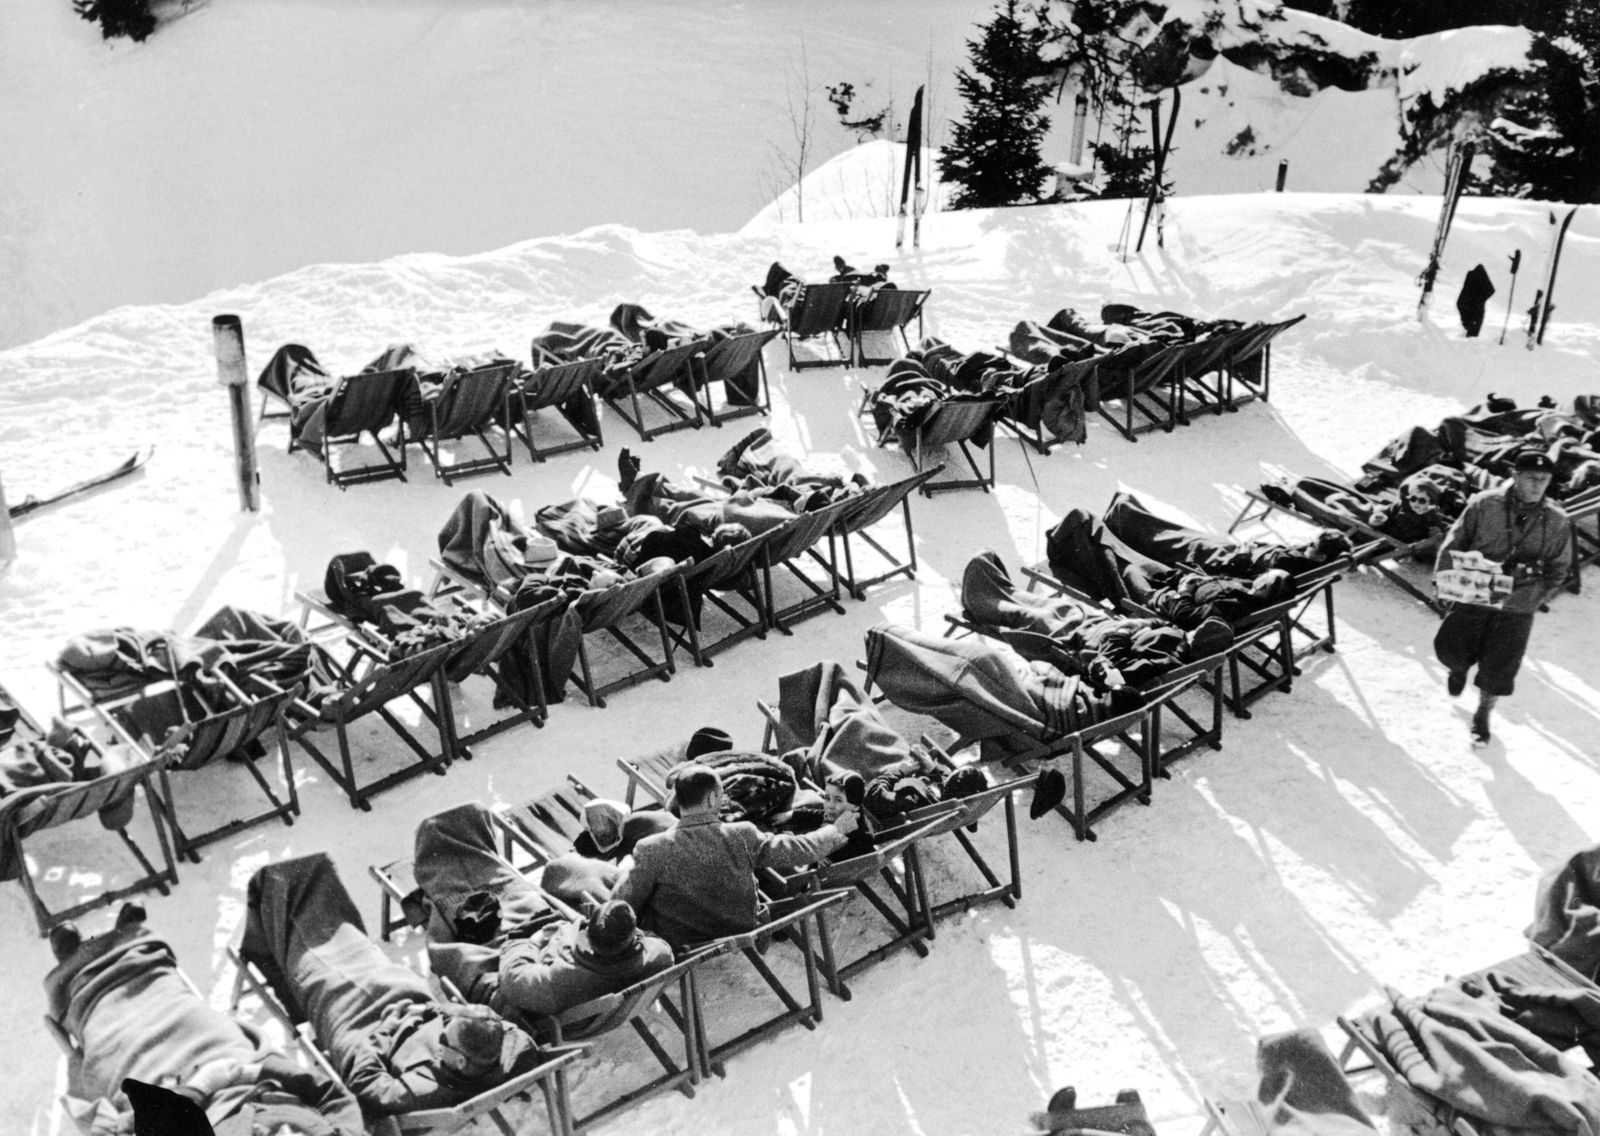 Winter Olympics 1936 Germany Third Reich Olympic Winter Games Winter Olympics 1936 in Garmisch